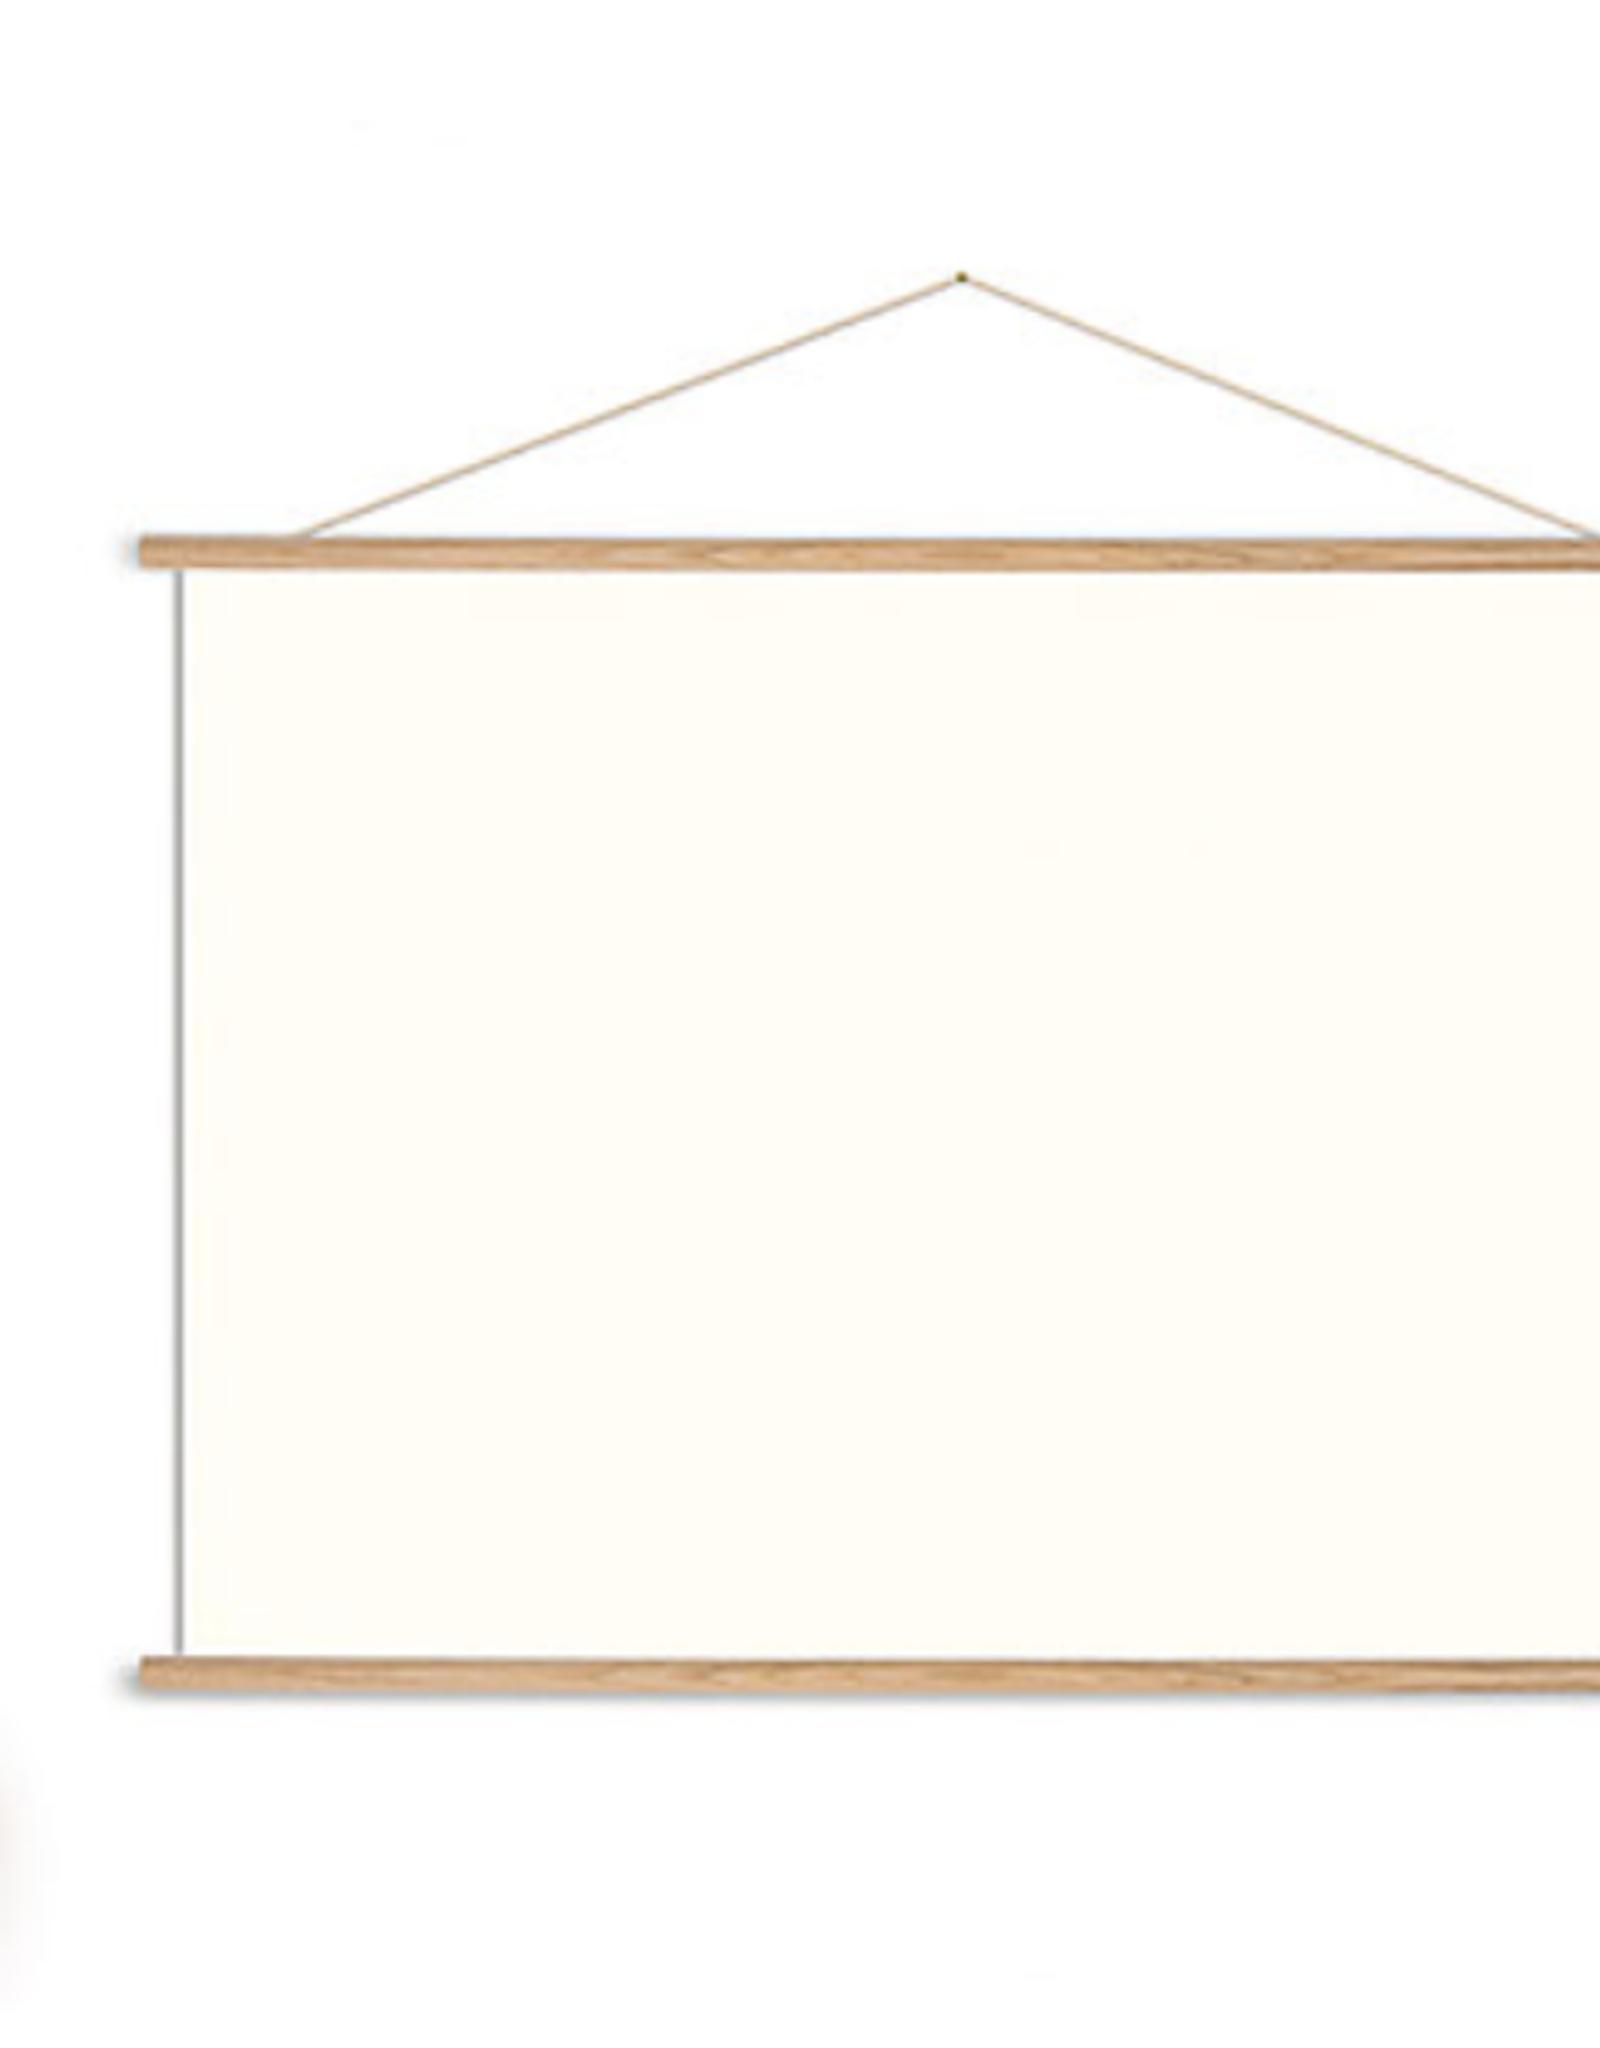 "Cavallini Vintage Poster Hanging Kit, 20"" x 28"" Horizontal"